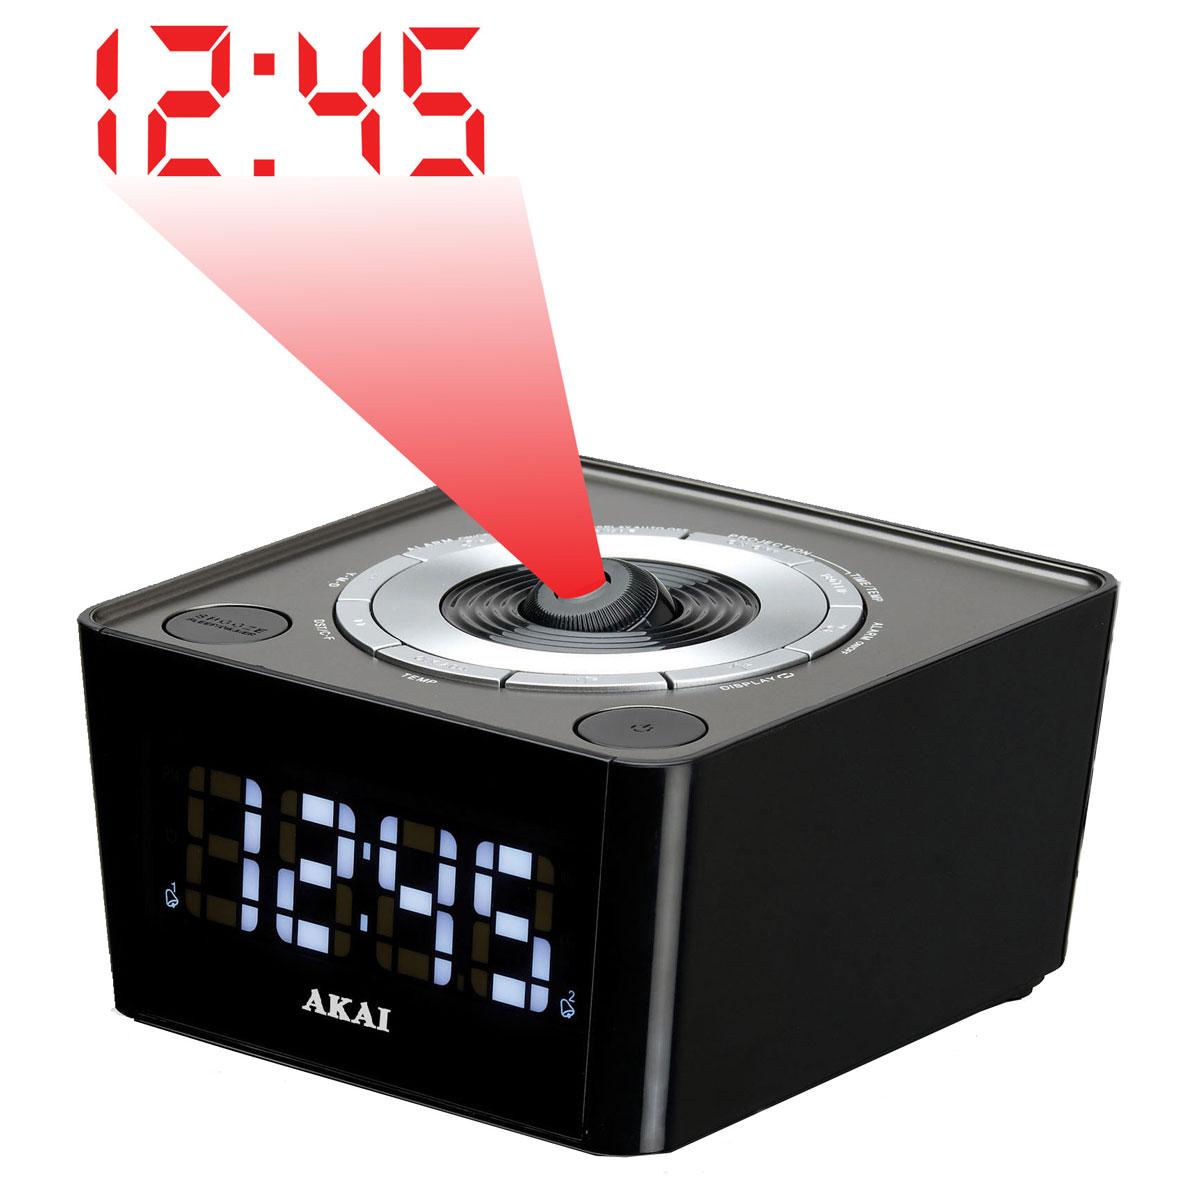 akai acp 64kt acp 64kt achat vente radio radio r veil sur. Black Bedroom Furniture Sets. Home Design Ideas